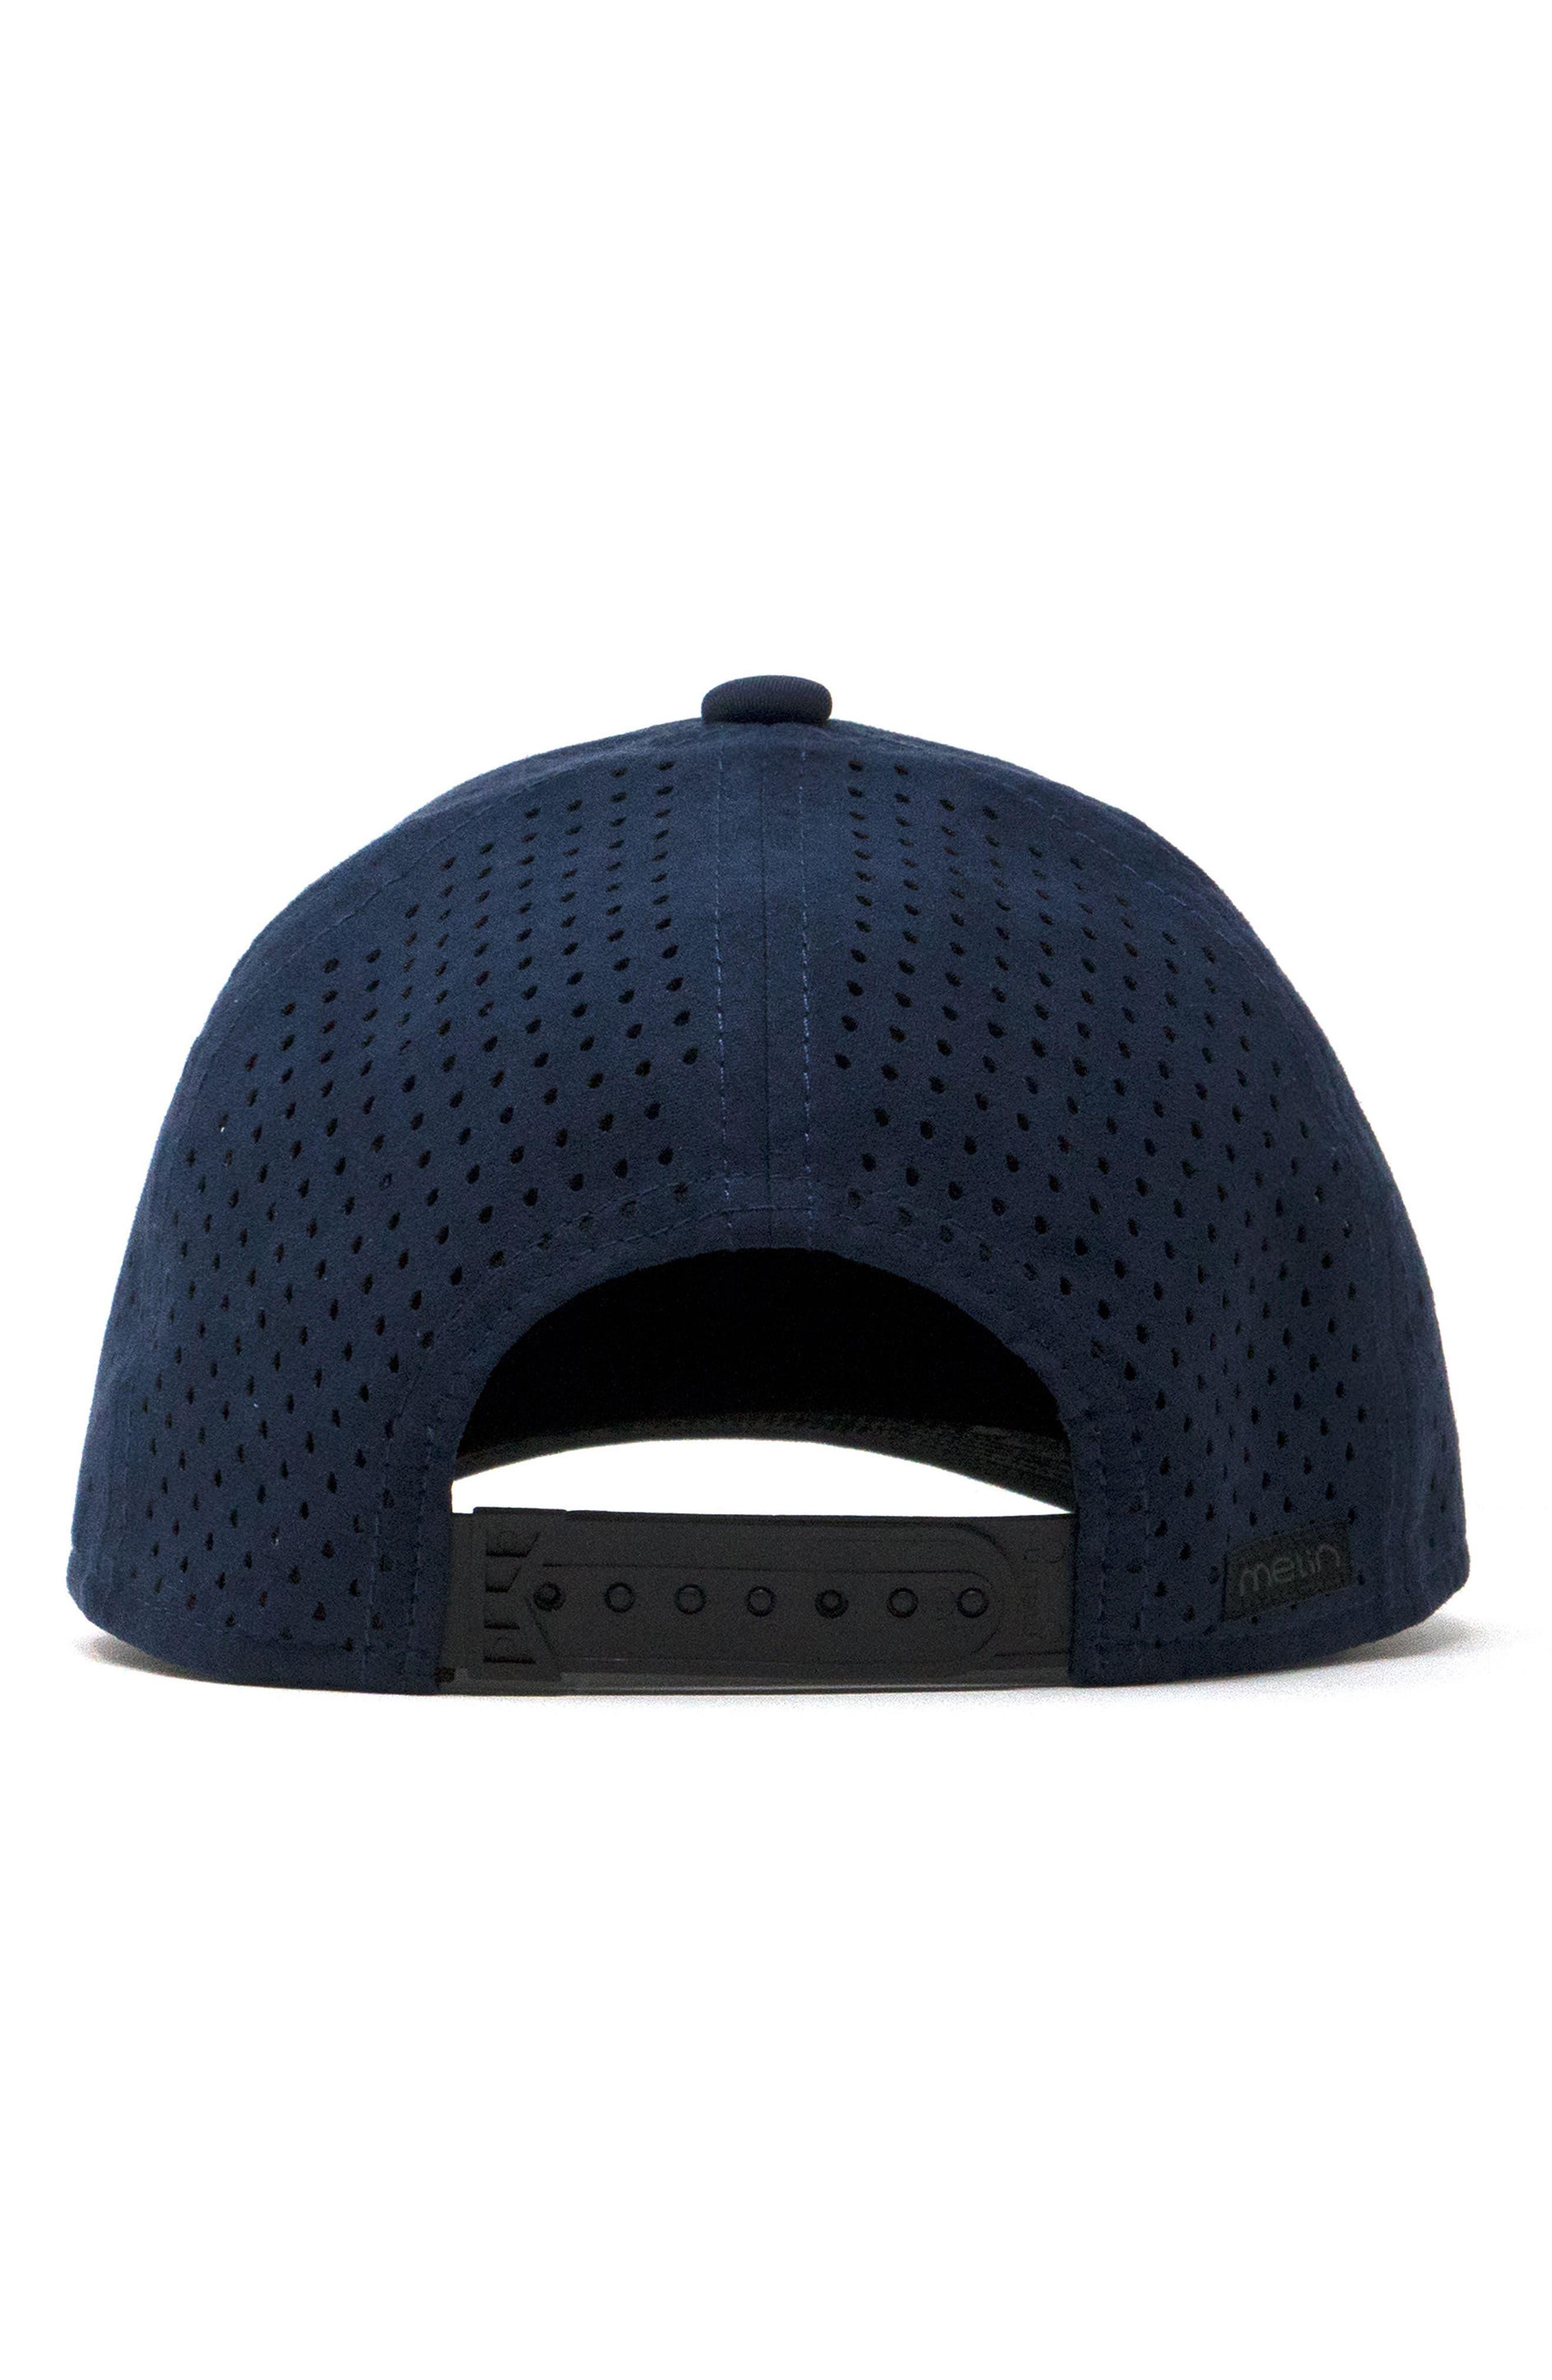 Trooper II Snapback Baseball Cap,                             Alternate thumbnail 4, color,                             Navy